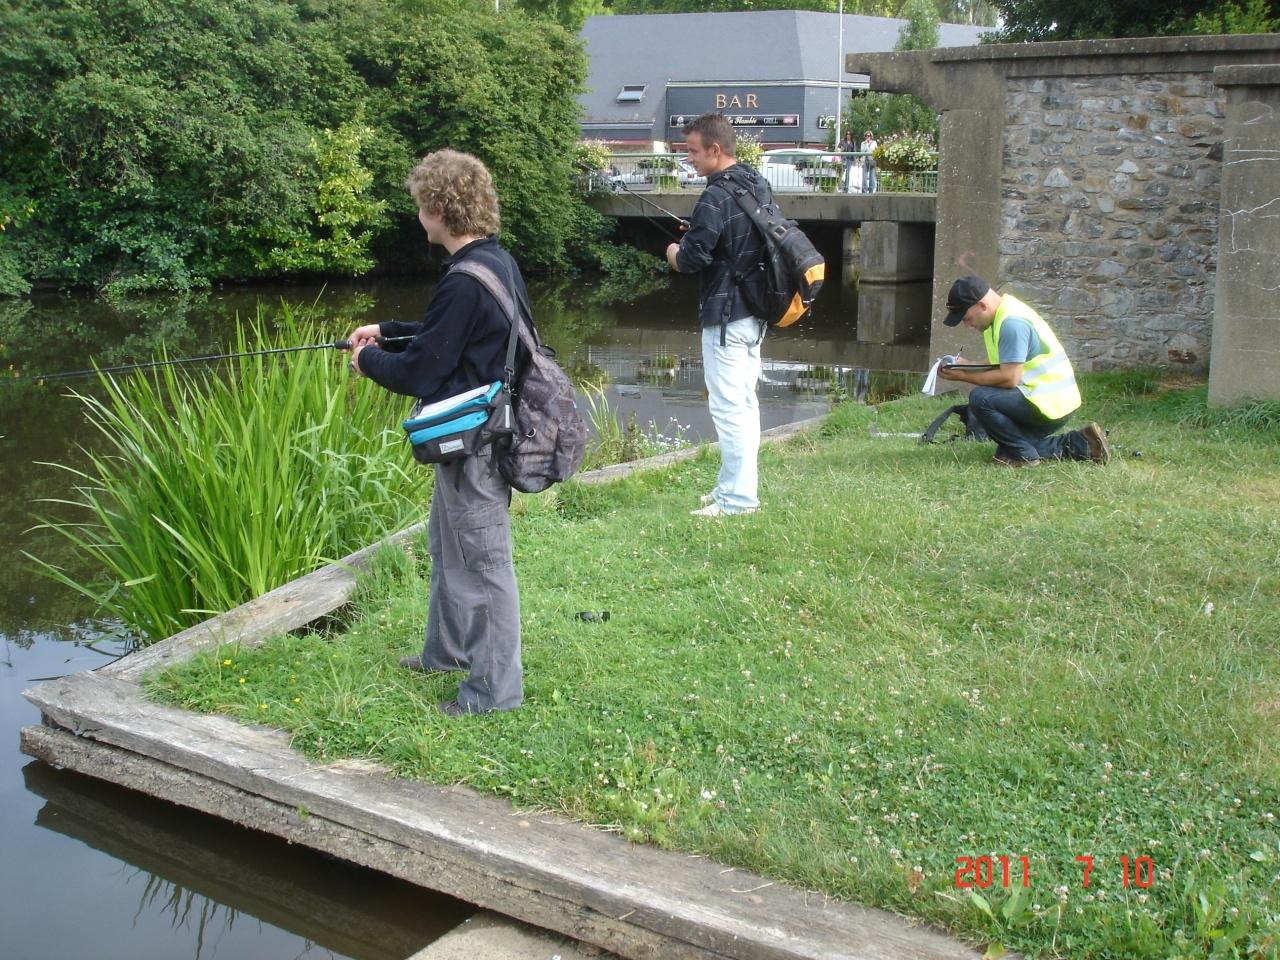 OPEN STREET FISHING BETTON 2011